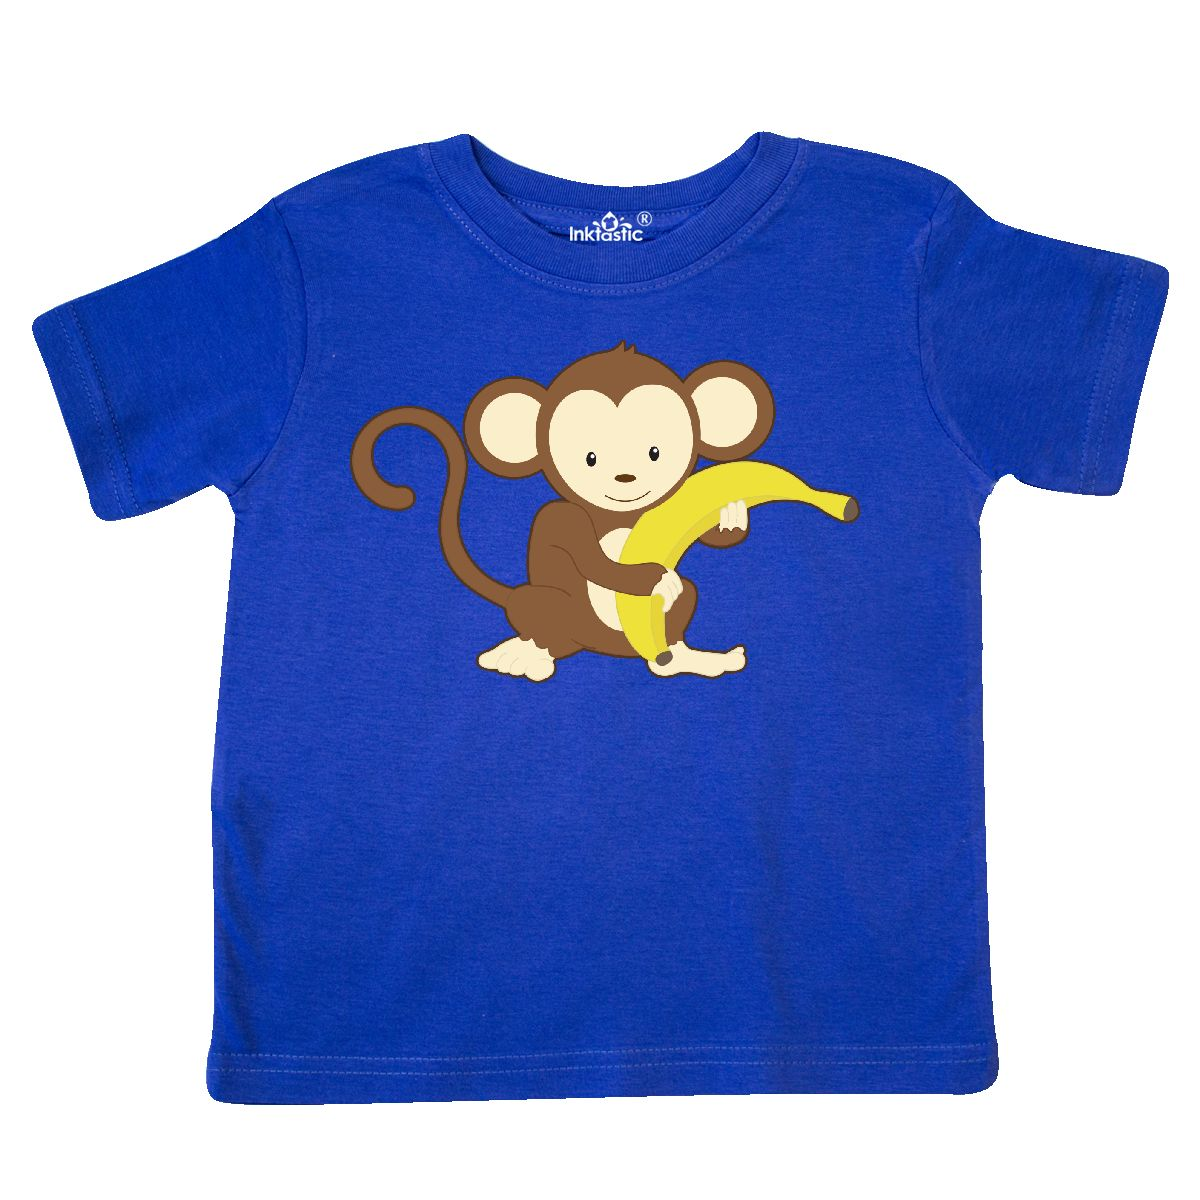 Blue Jacket Blue Boots Toddler T-Shirt Blonde Hair inktastic Fashion Girl